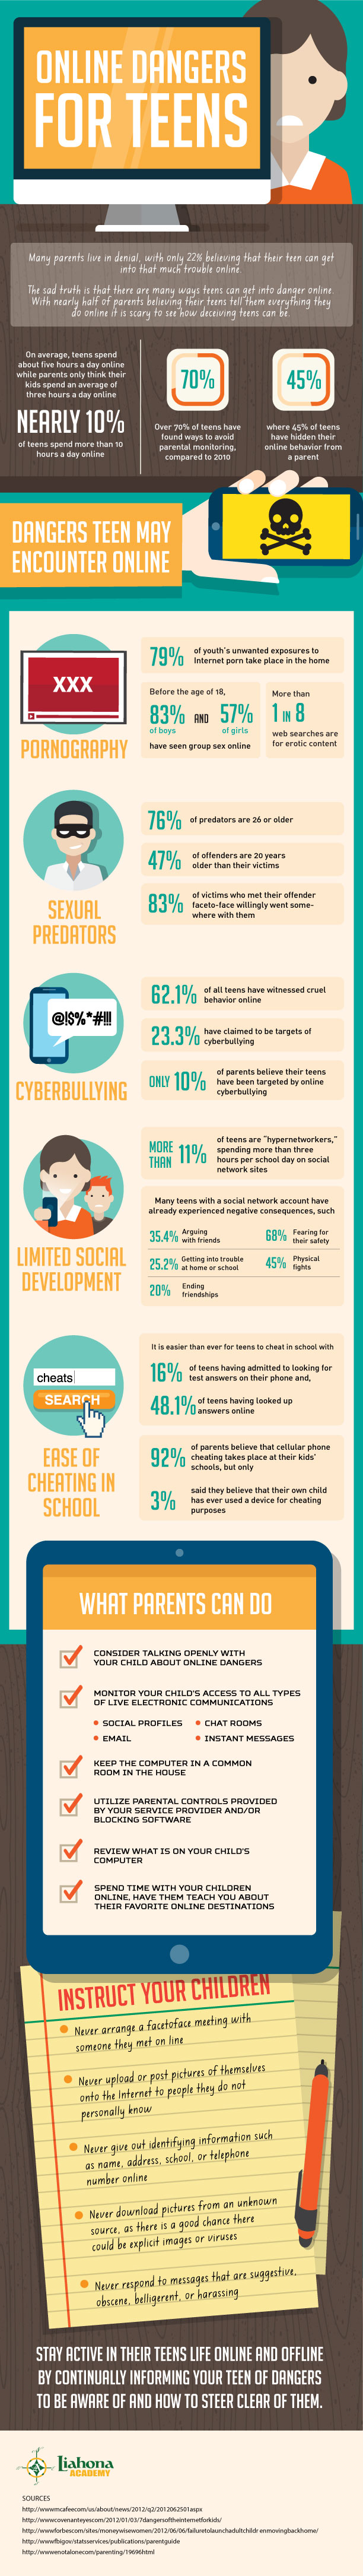 Online Dangers For Teens Infographic